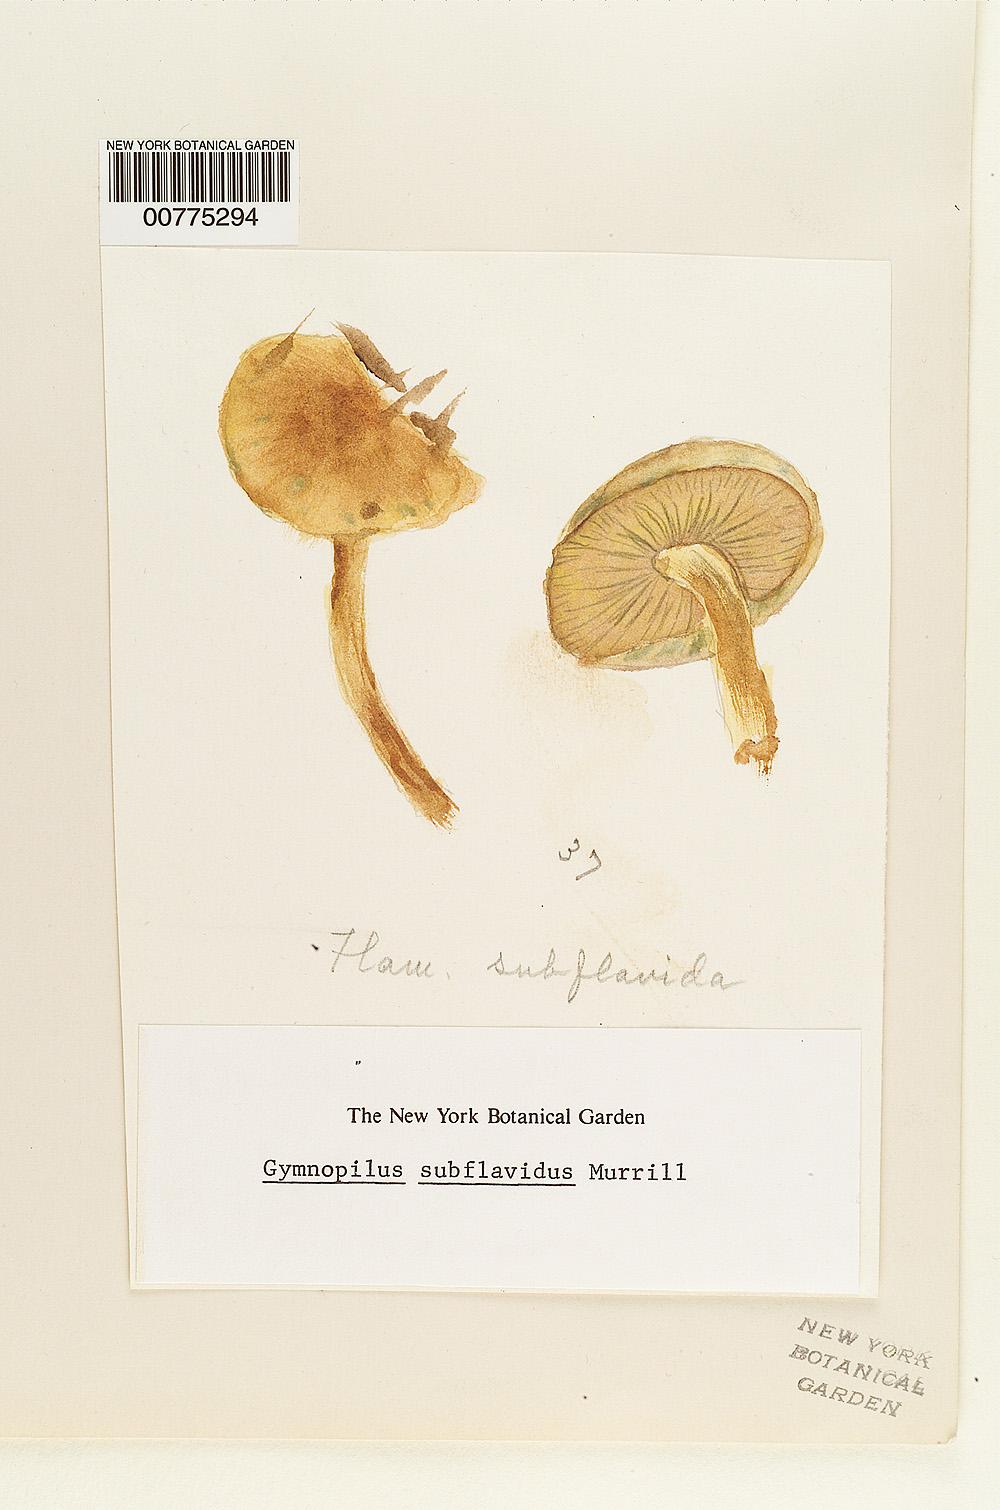 Gymnopilus subflavidus image